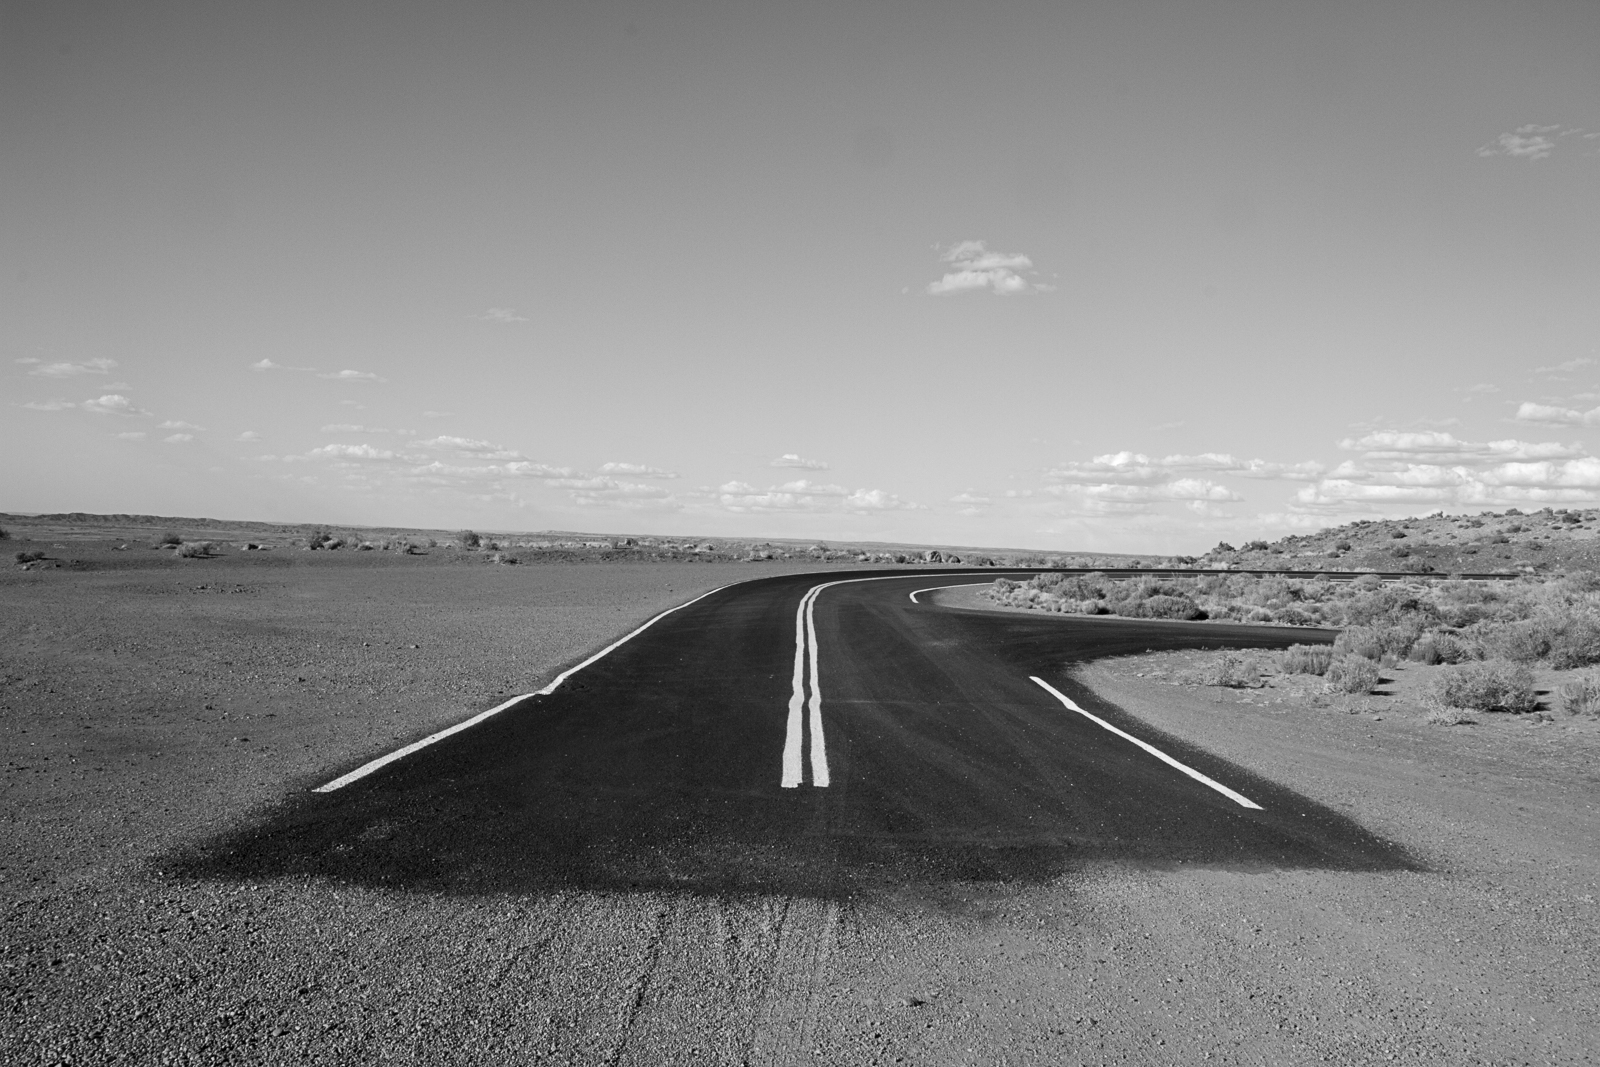 Road_new_10.jpg